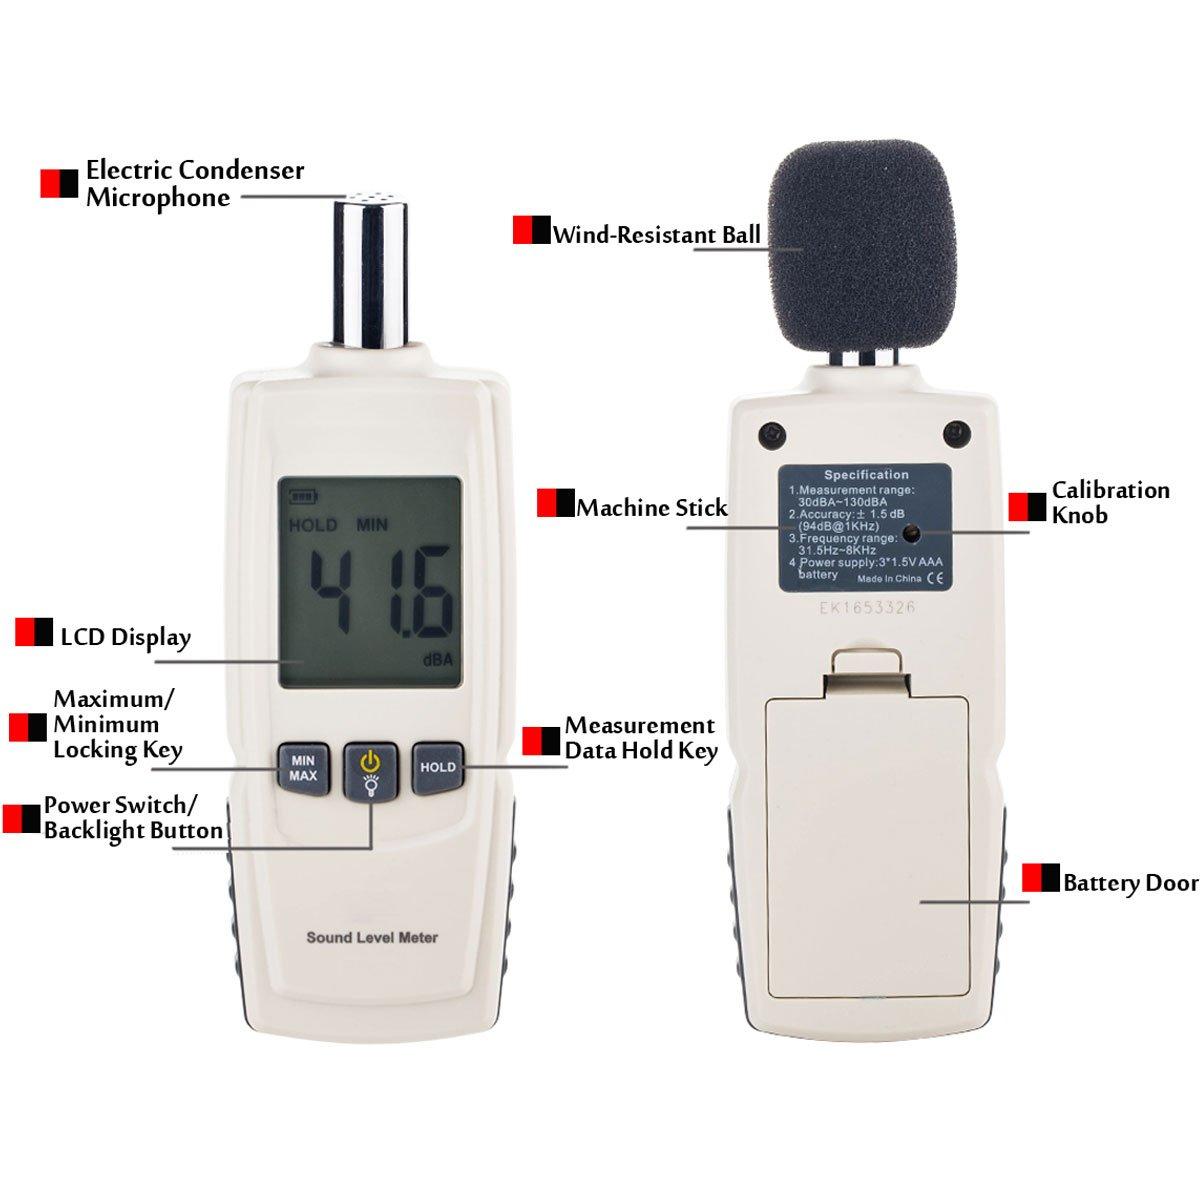 30~130dB Dezibel Schallpegelmesser Handheld Schallpegelmessgerät Lärm Messgerät